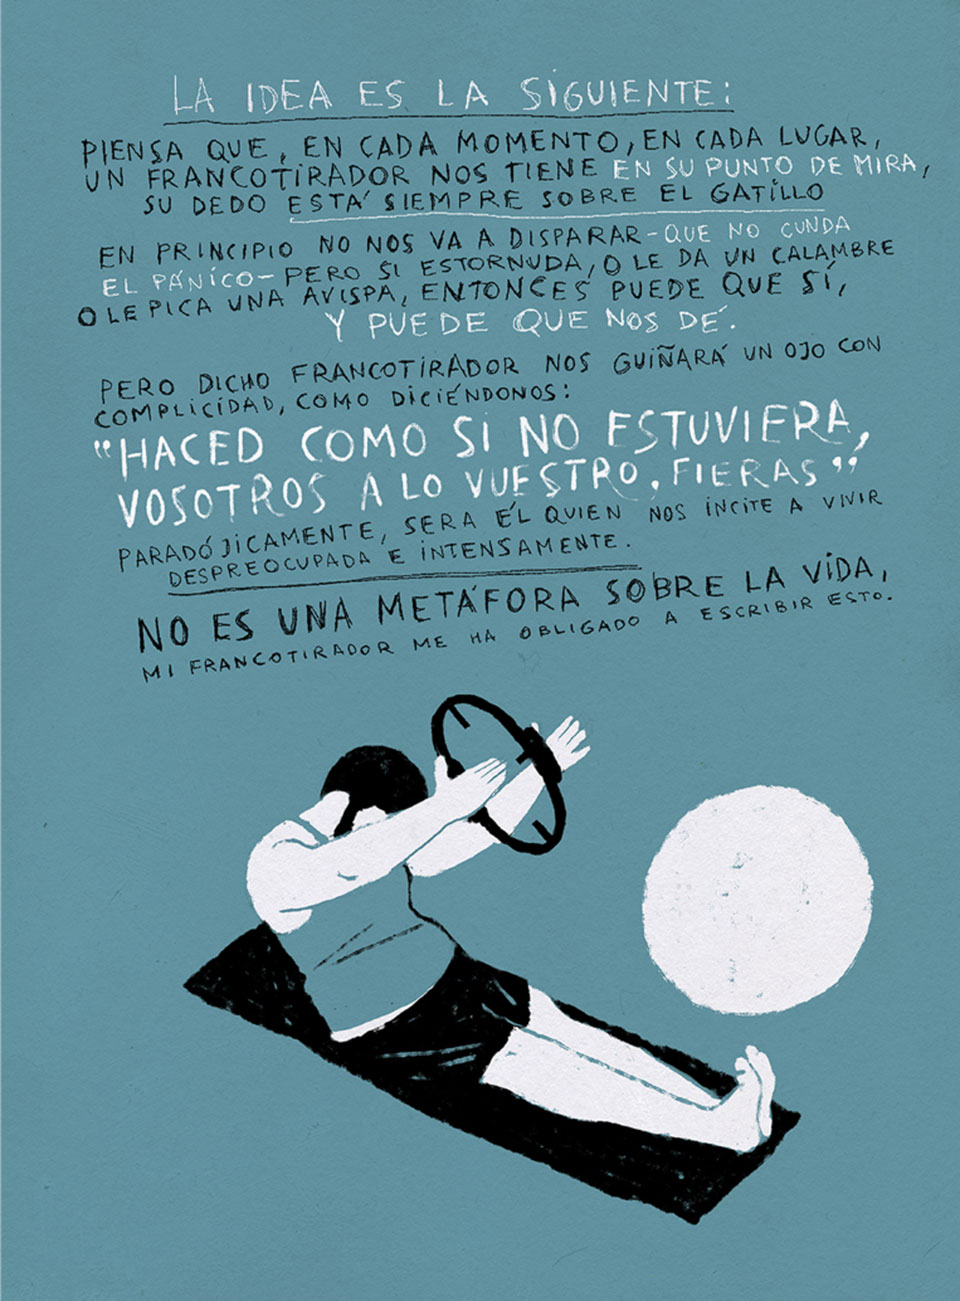 Riki Blanco - El Camino Mas Largo - Ilustracion44